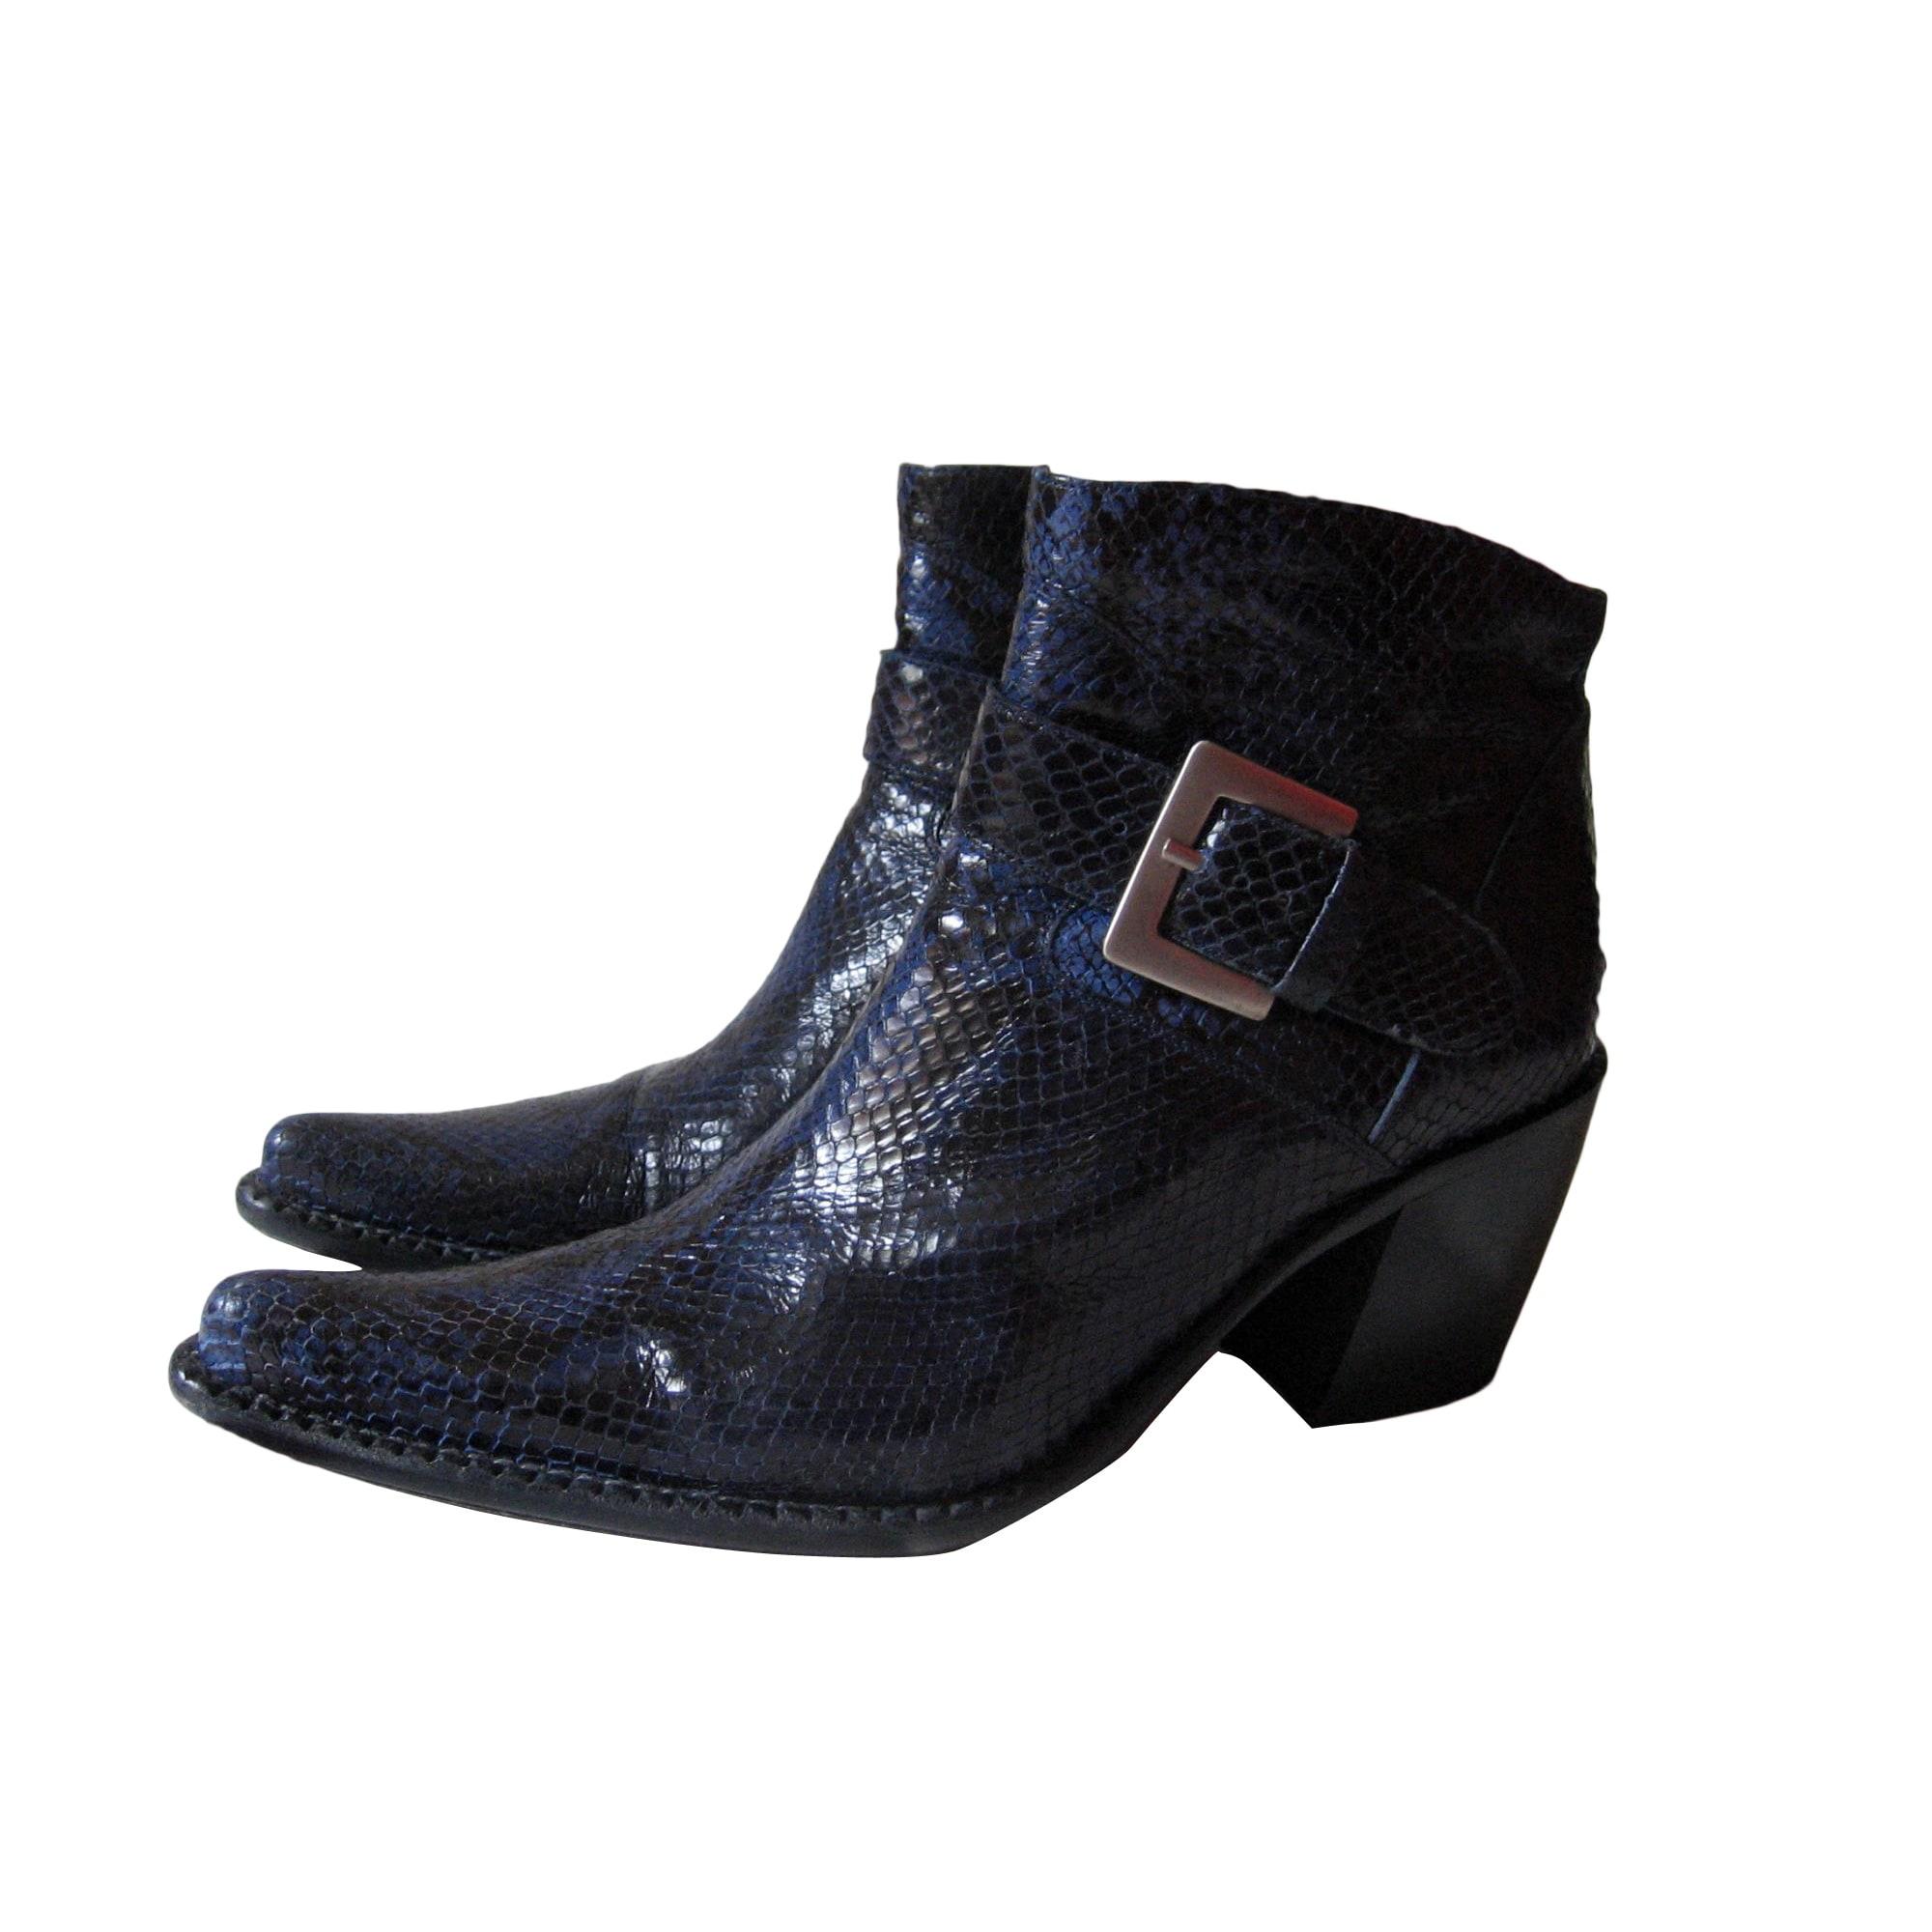 Bottines & low boots à talons FREE LANCE Bleu, bleu marine, bleu turquoise